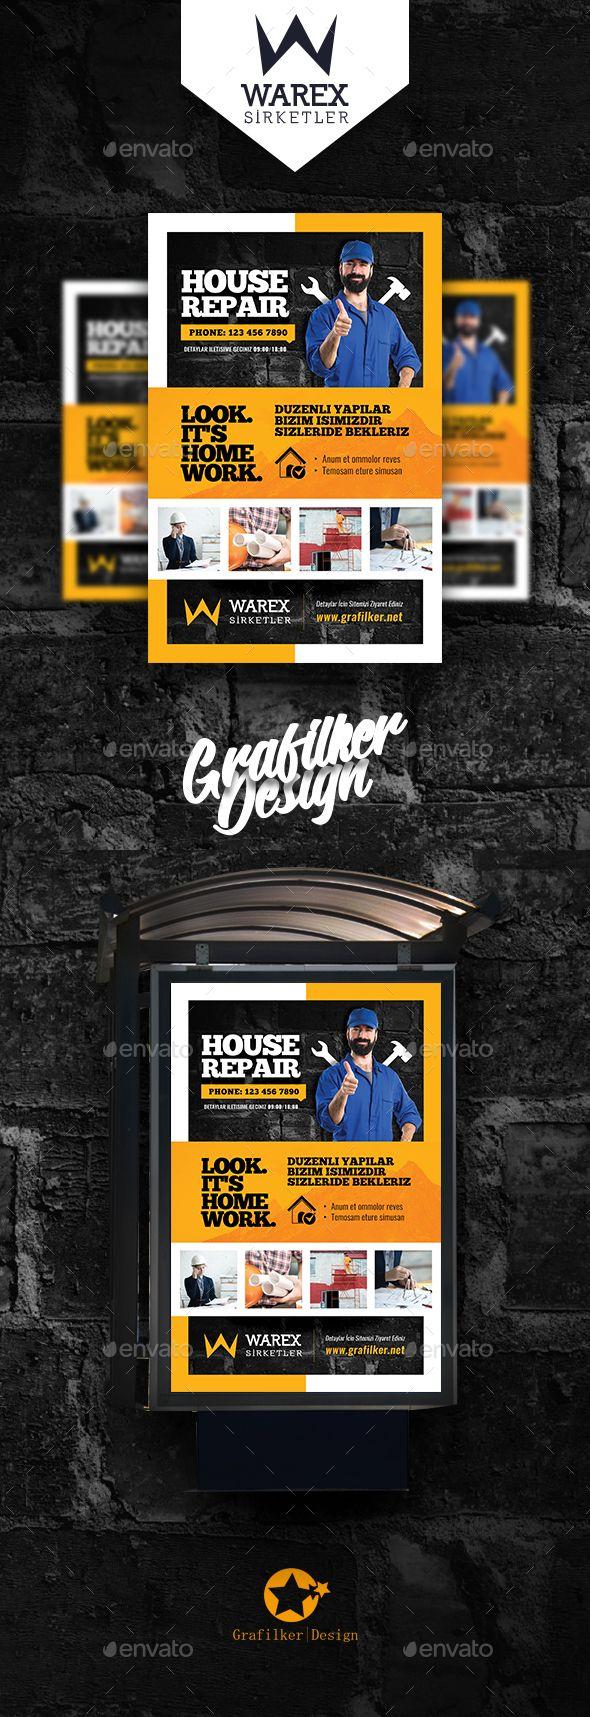 House Repair Poster Templates